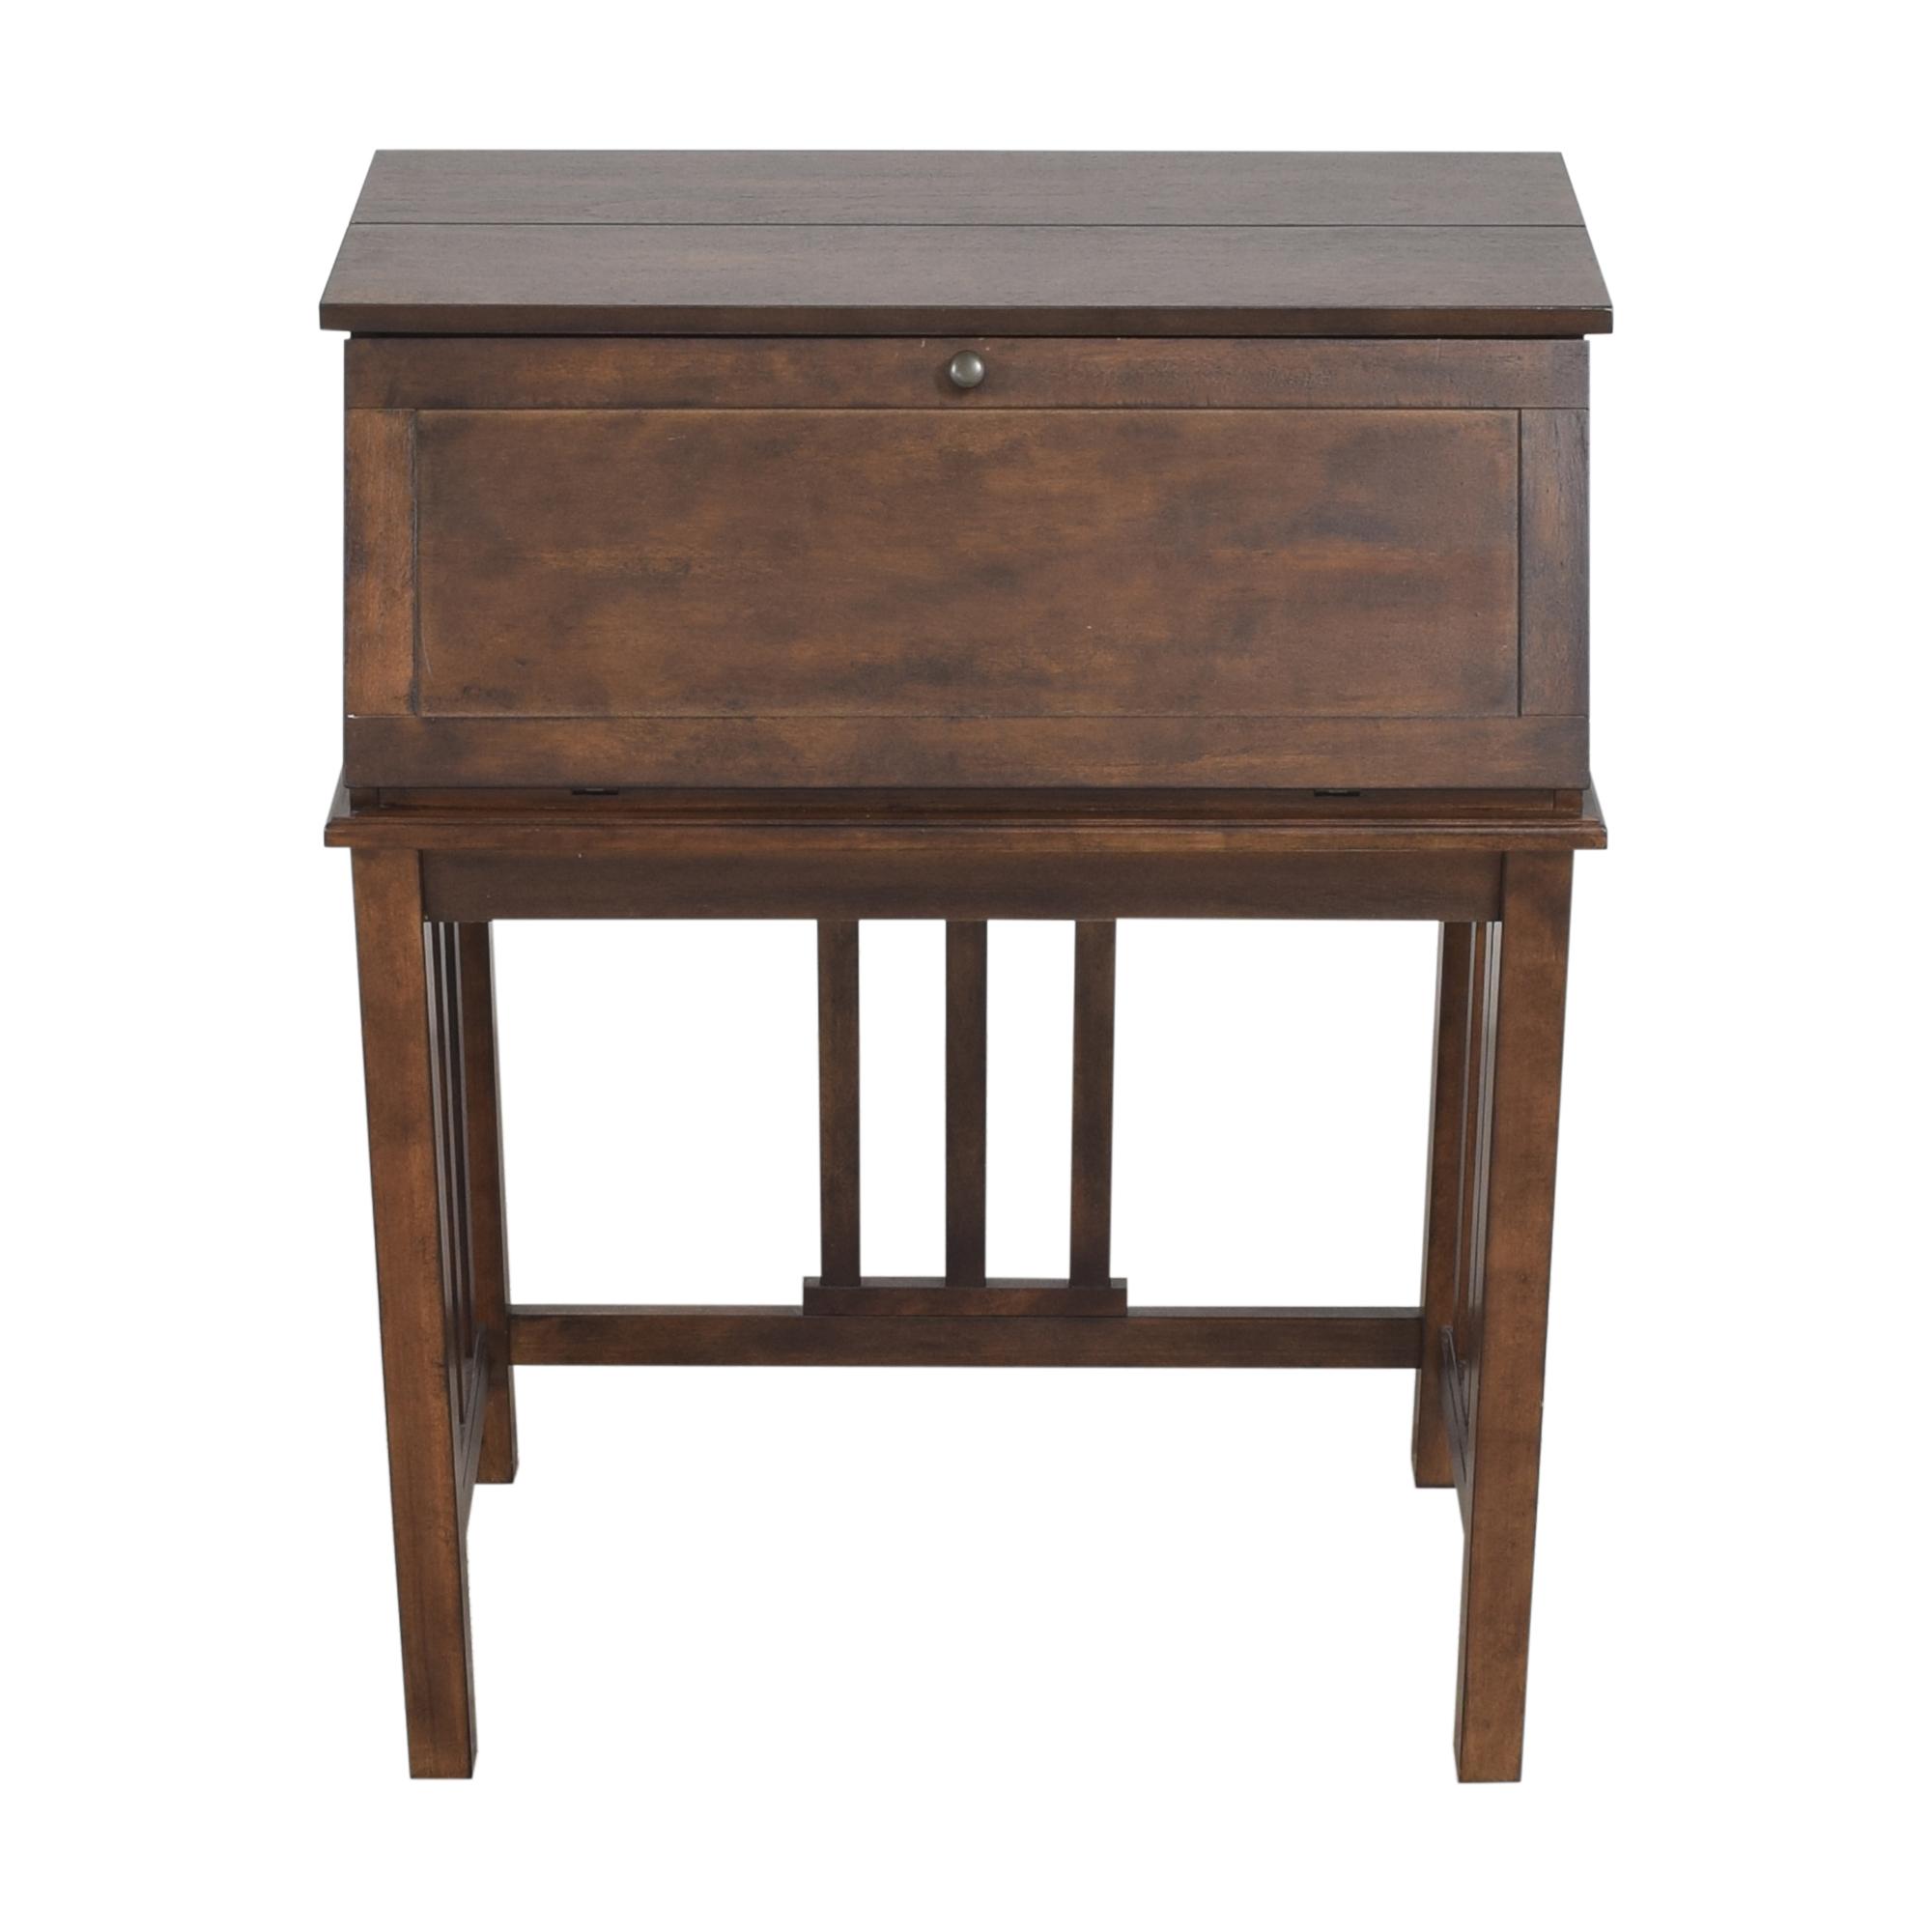 Ashley Furniture Ashley Furniture Harpan Desk coupon